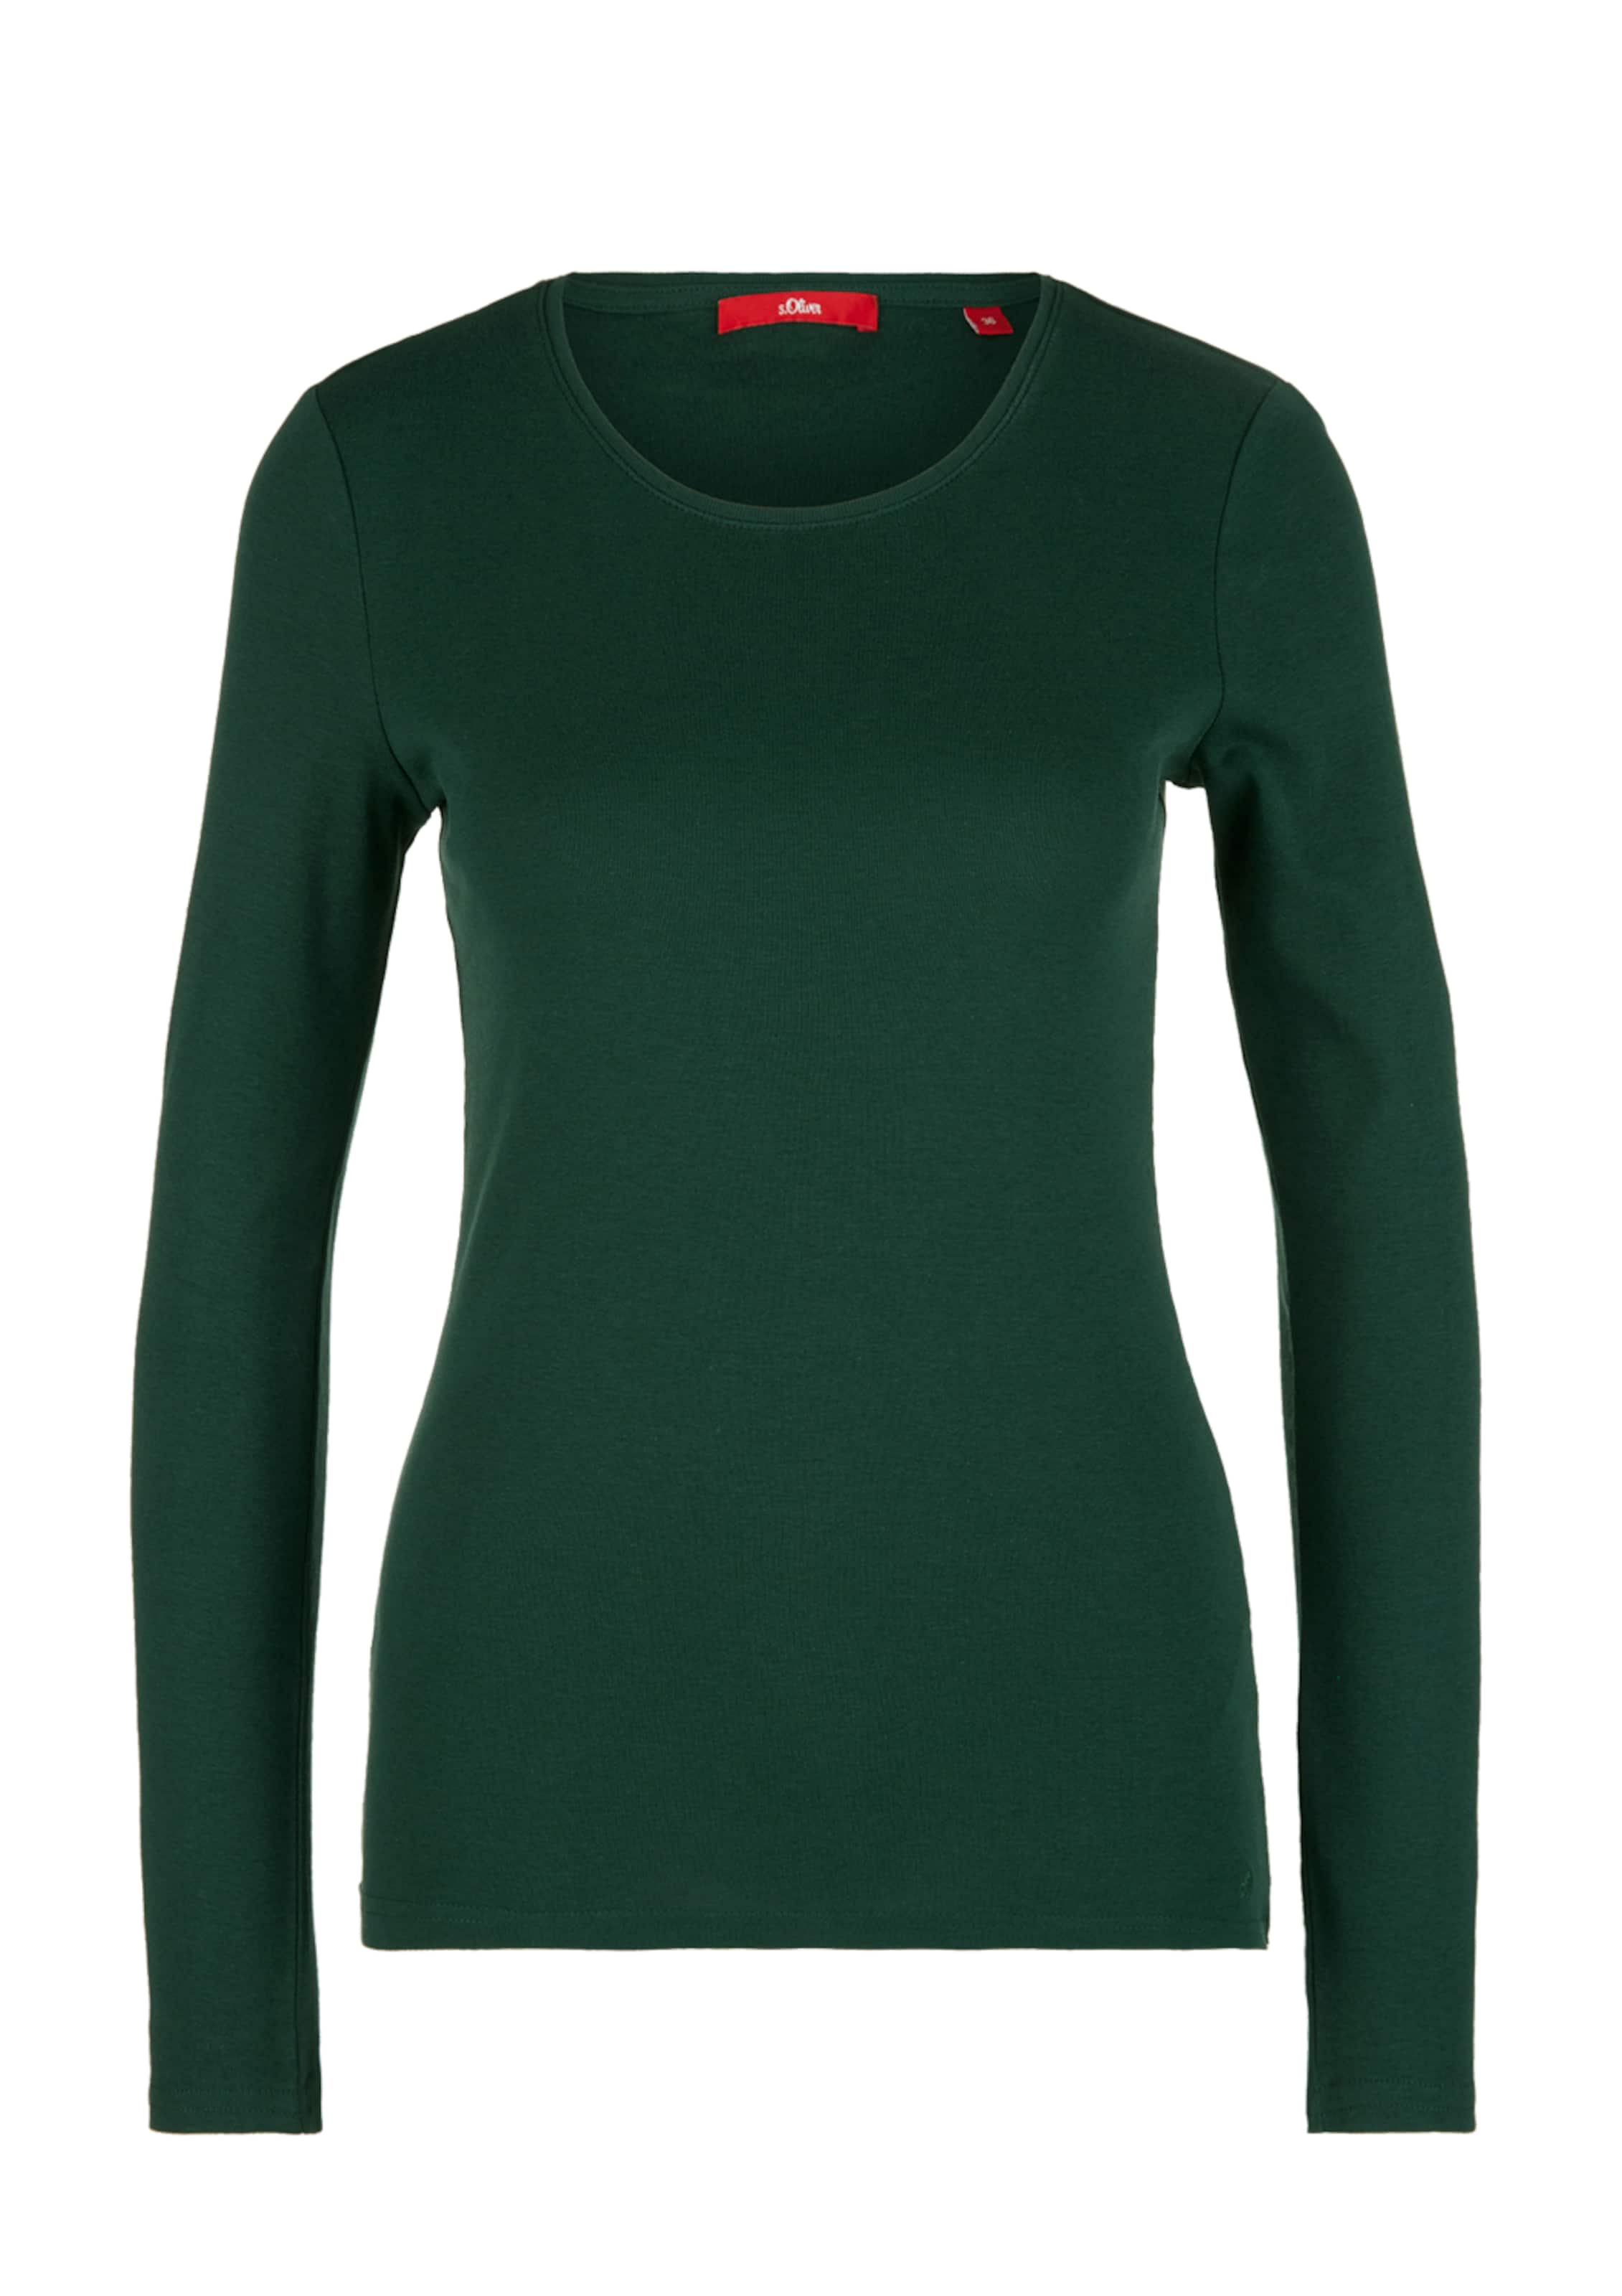 S Red oliver Shirt In Dunkelgrün Label 8wNvmn0